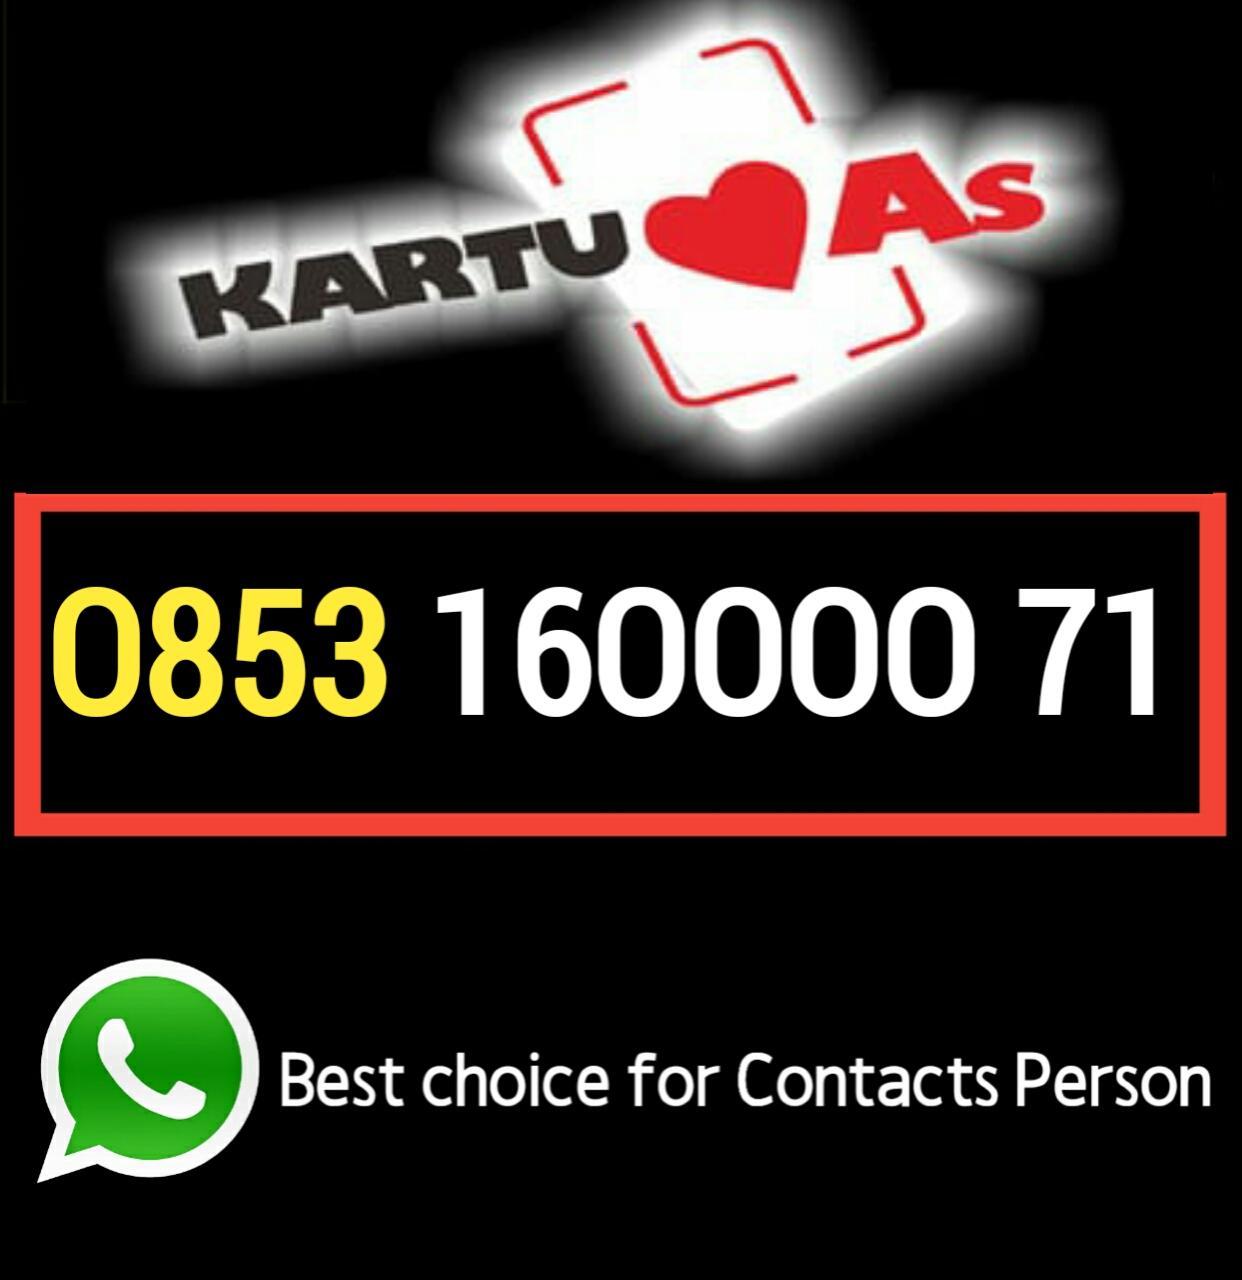 Nomor cantik 0853 160000 71 kartu perdana as Telkomsel